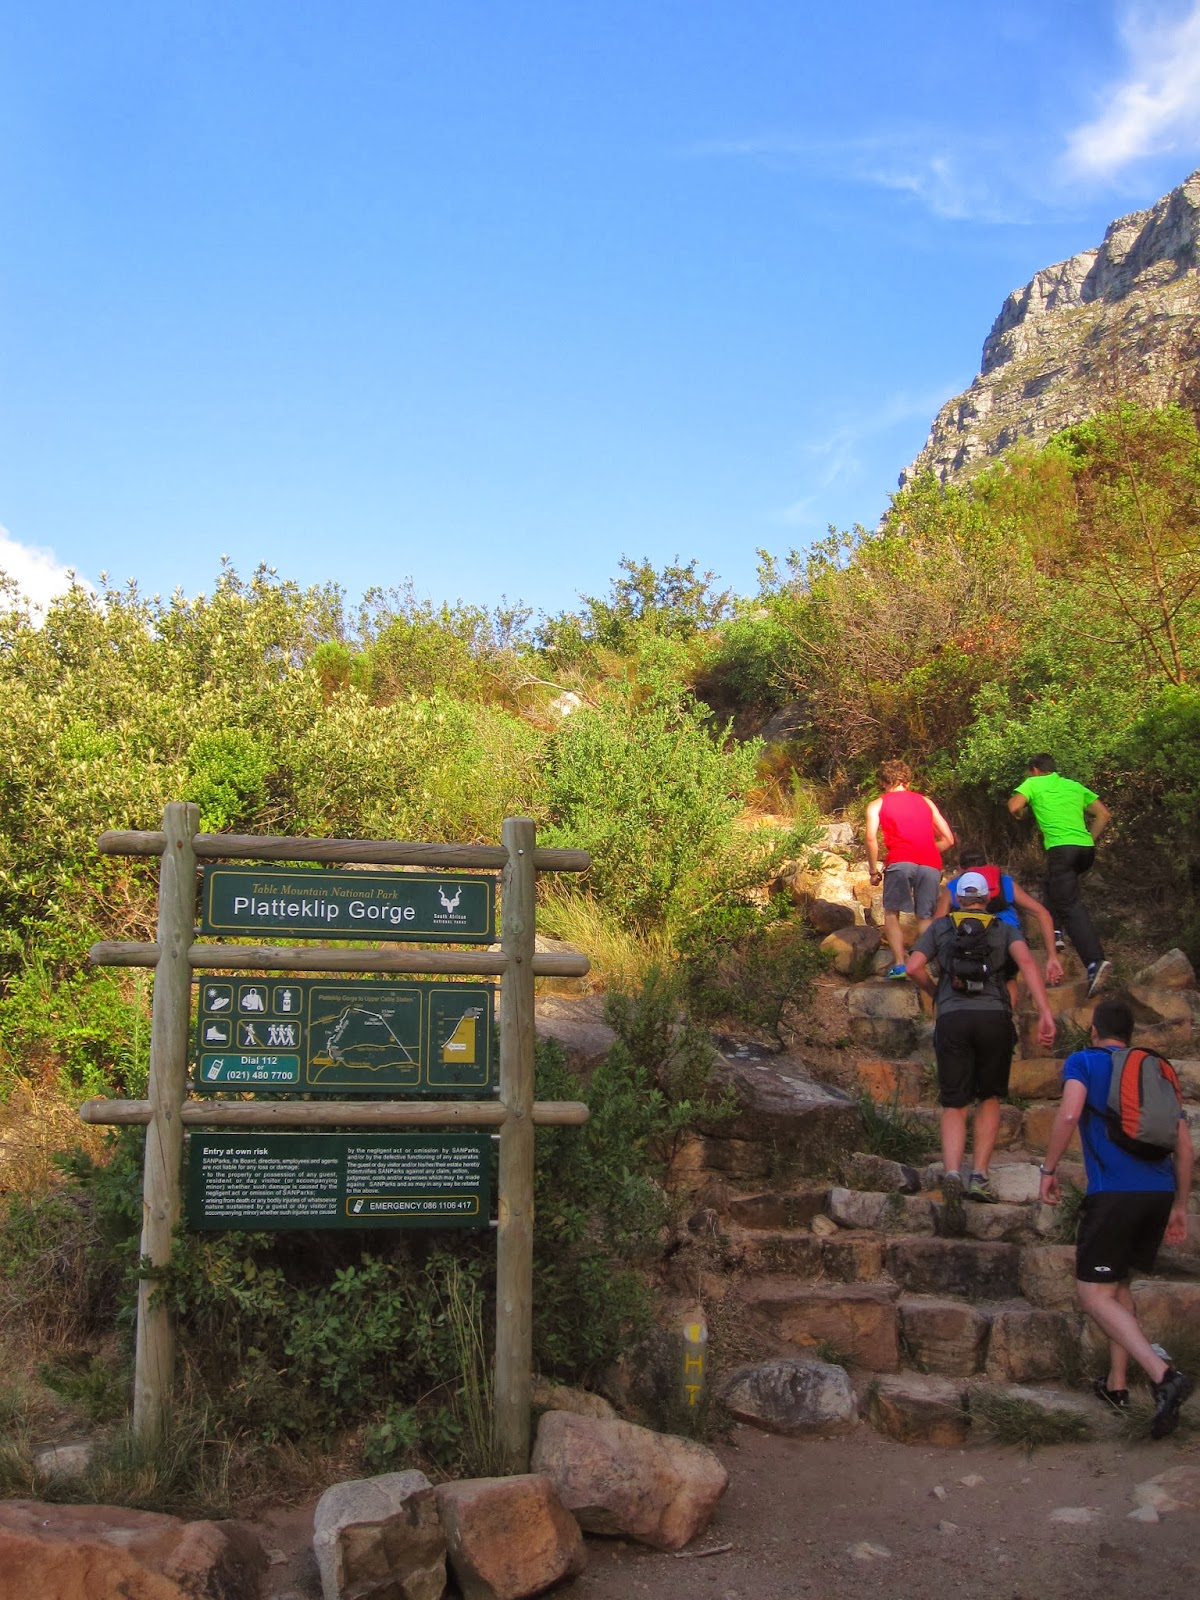 Platteklip Gorge To Nursery Ravine Trail Run Plasttekpp The Start Of